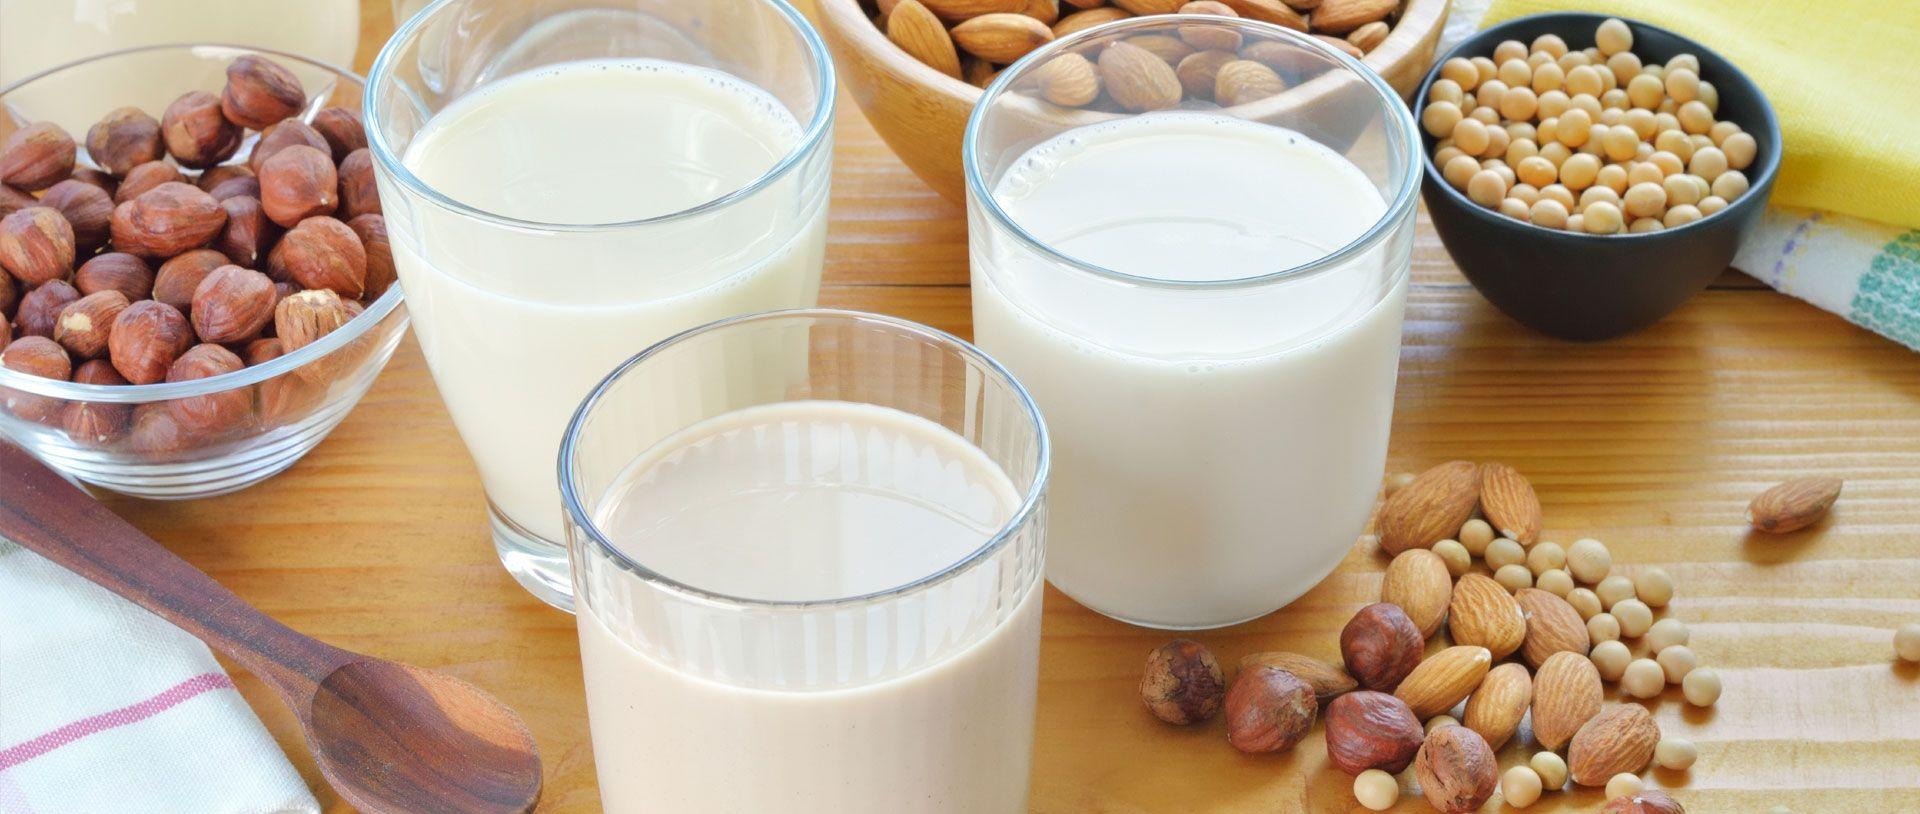 Is Almond Milk Healthier Than Cow's Milk?